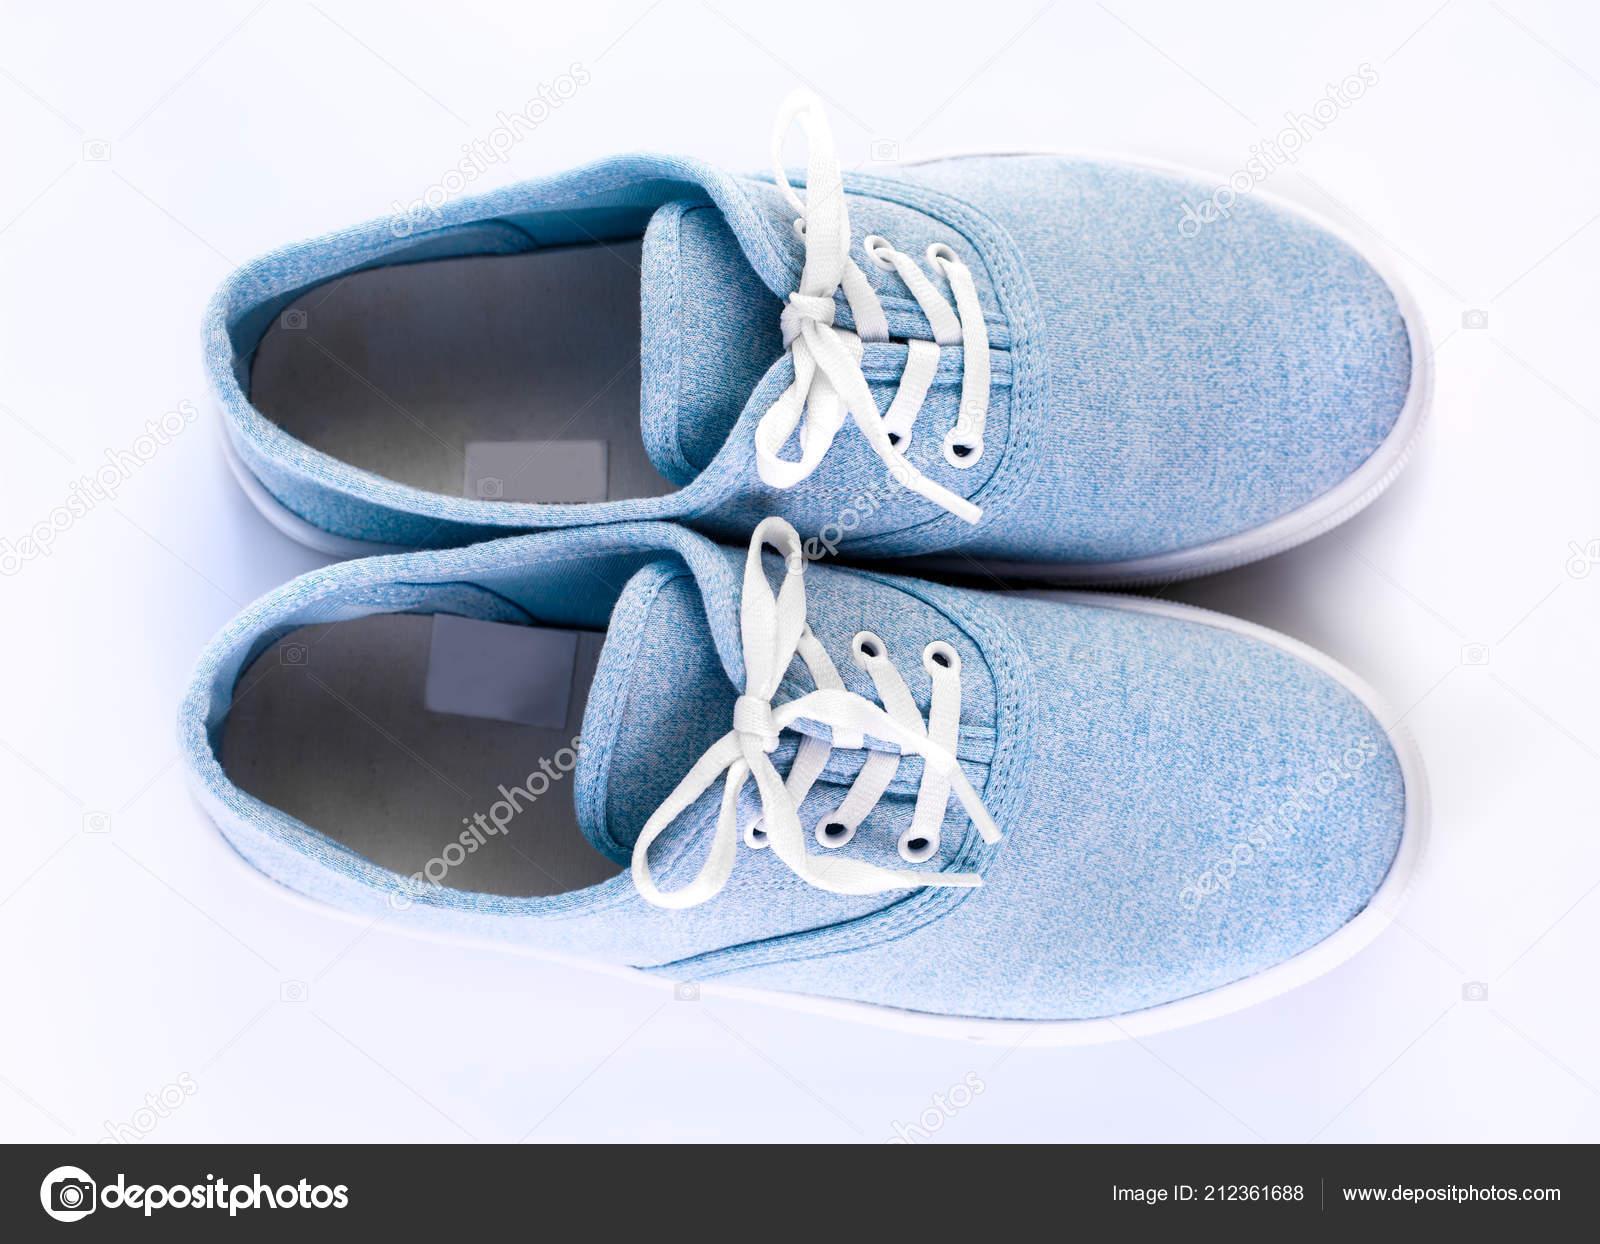 9e2f4f4c471 Μπλε Ύπουλος Λευκό Φόντο Κυανού Κλασικά Αθλητικά Παπούτσια Λευκά Κορδόνια —  Φωτογραφία Αρχείου